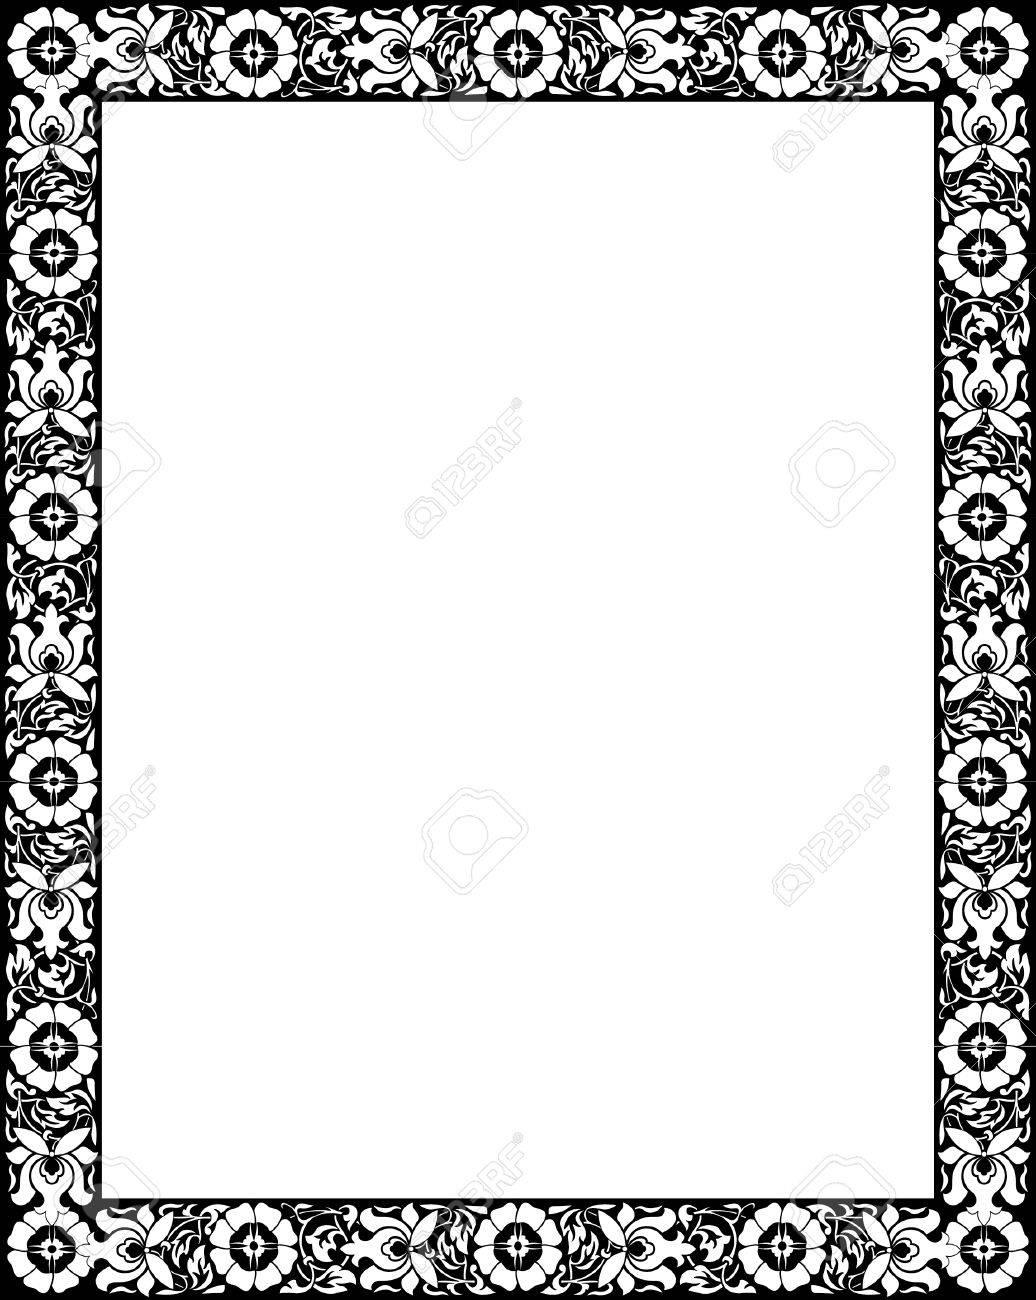 Flourish border frame, monochrome Stock Vector - 23185857